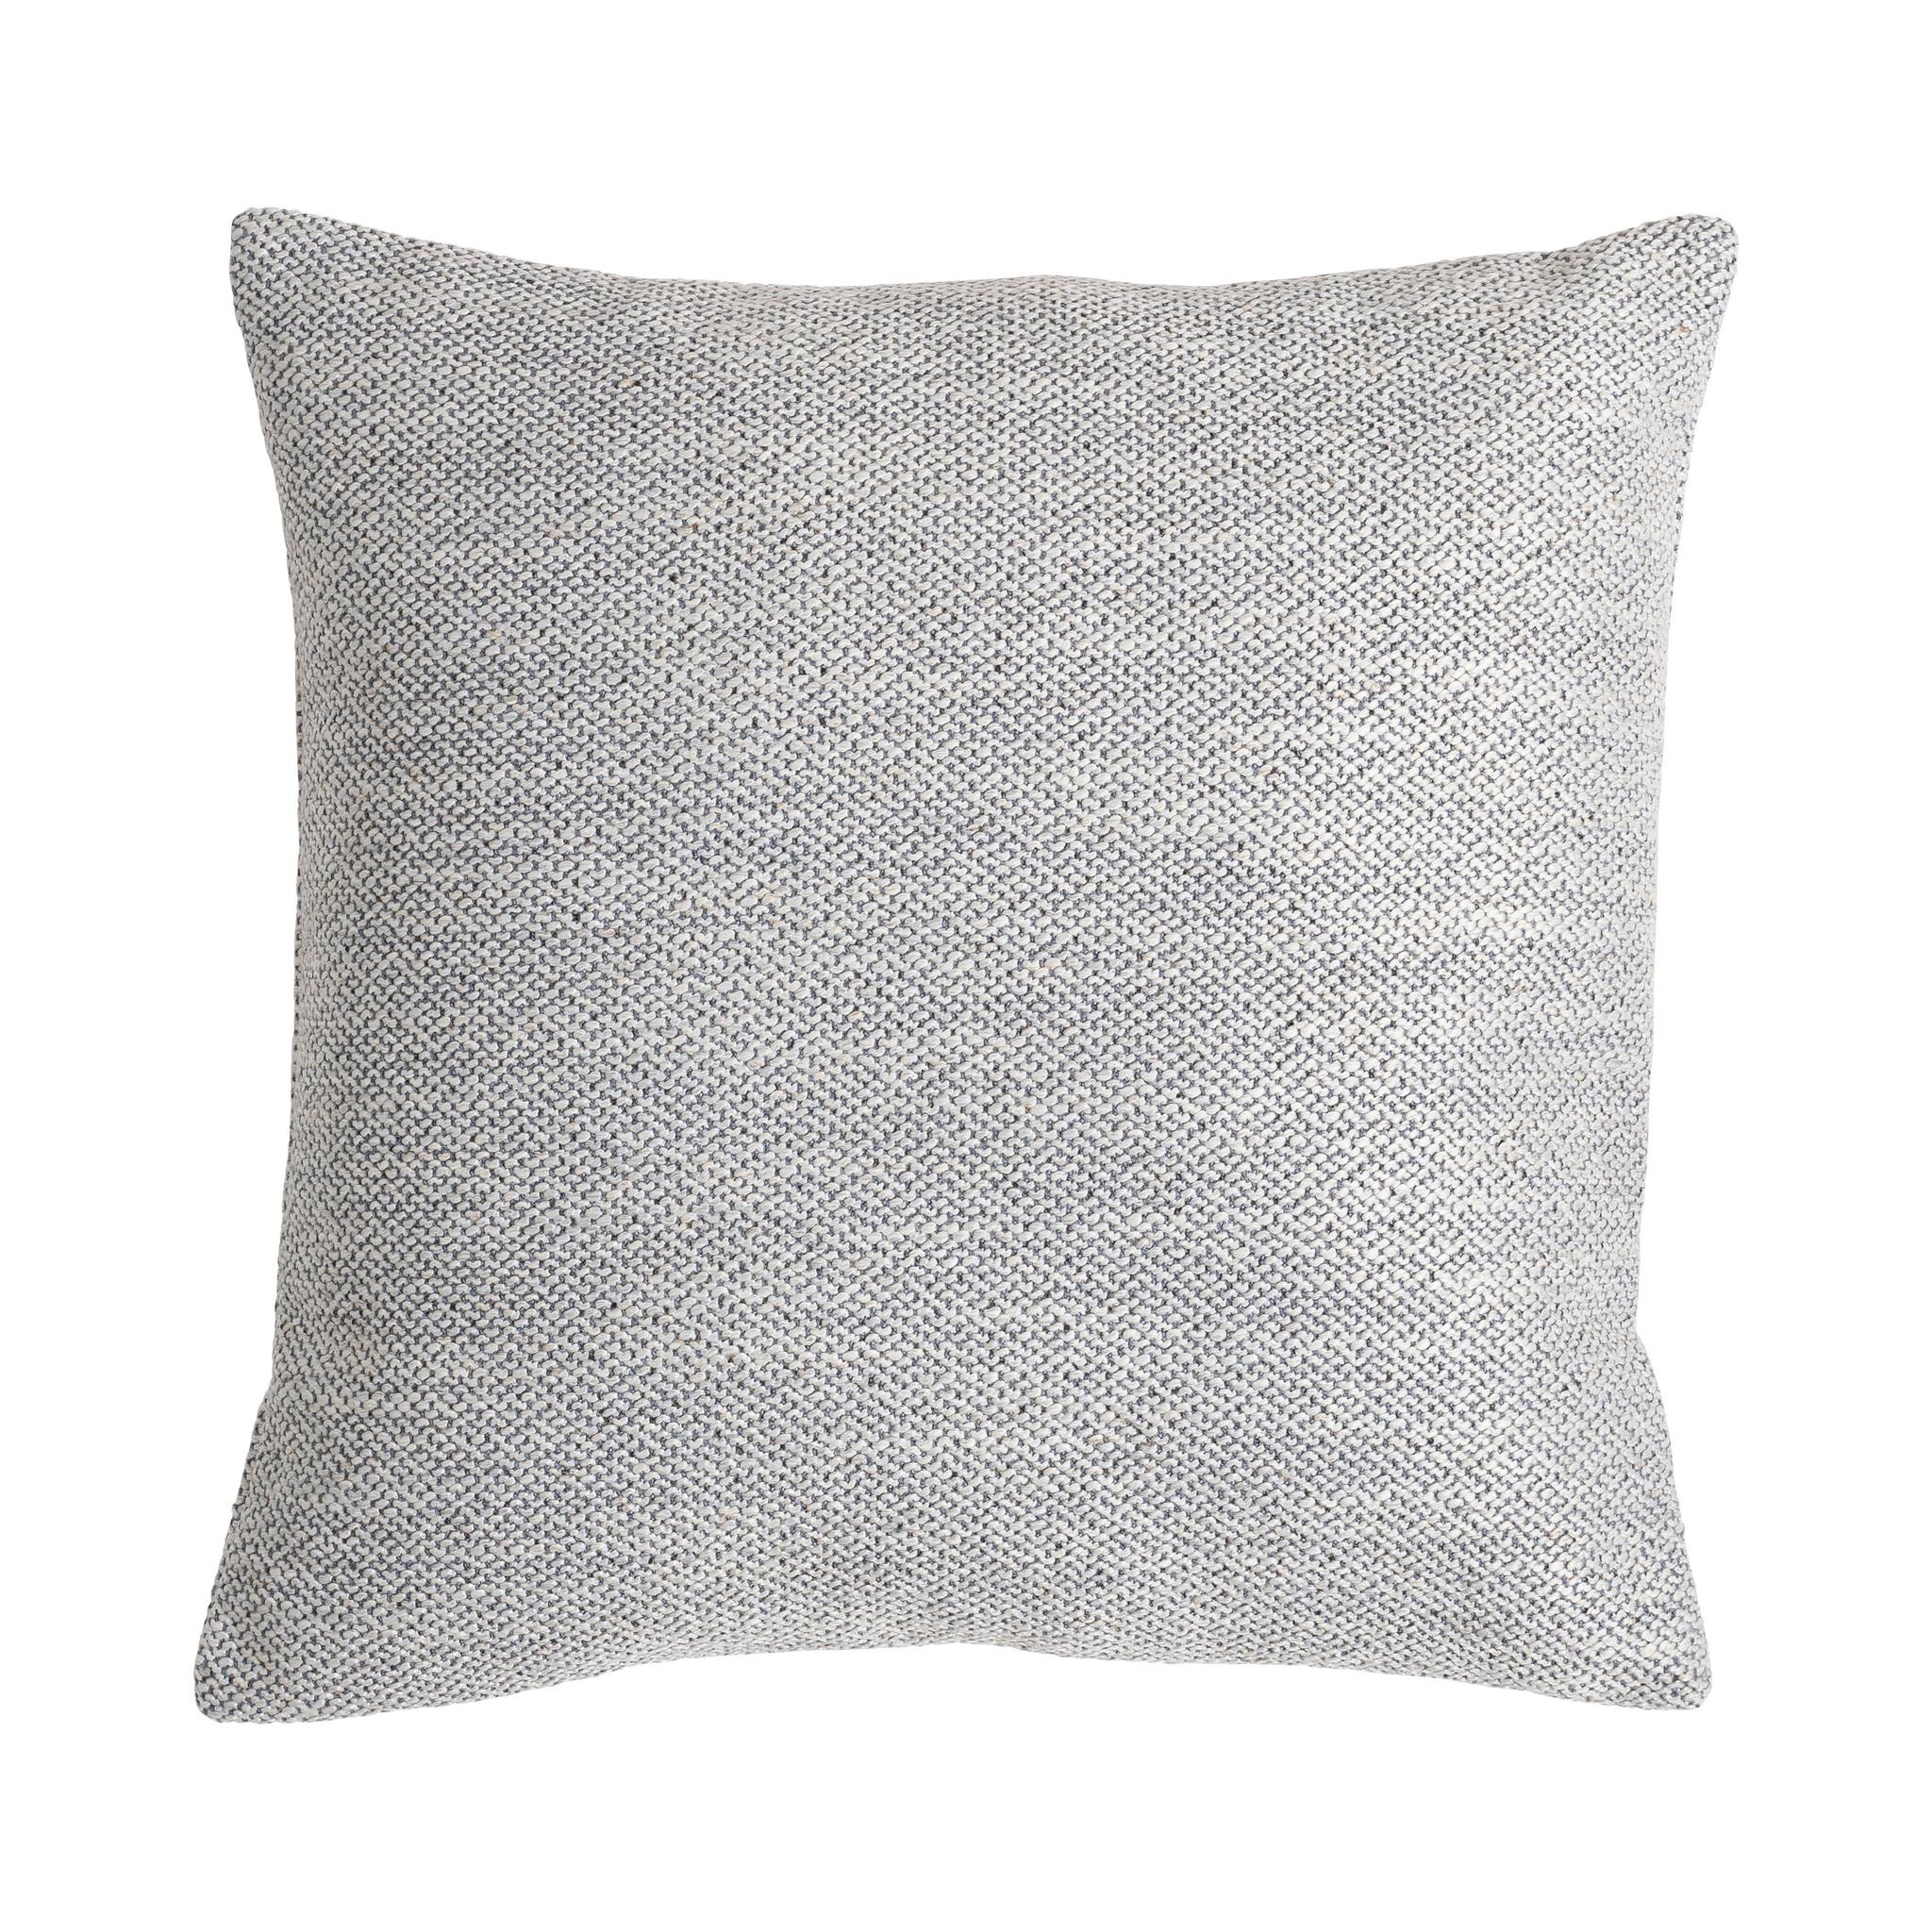 Presence Sierkussenhoes Mous - Zilver Kleur: Zilvergrijs